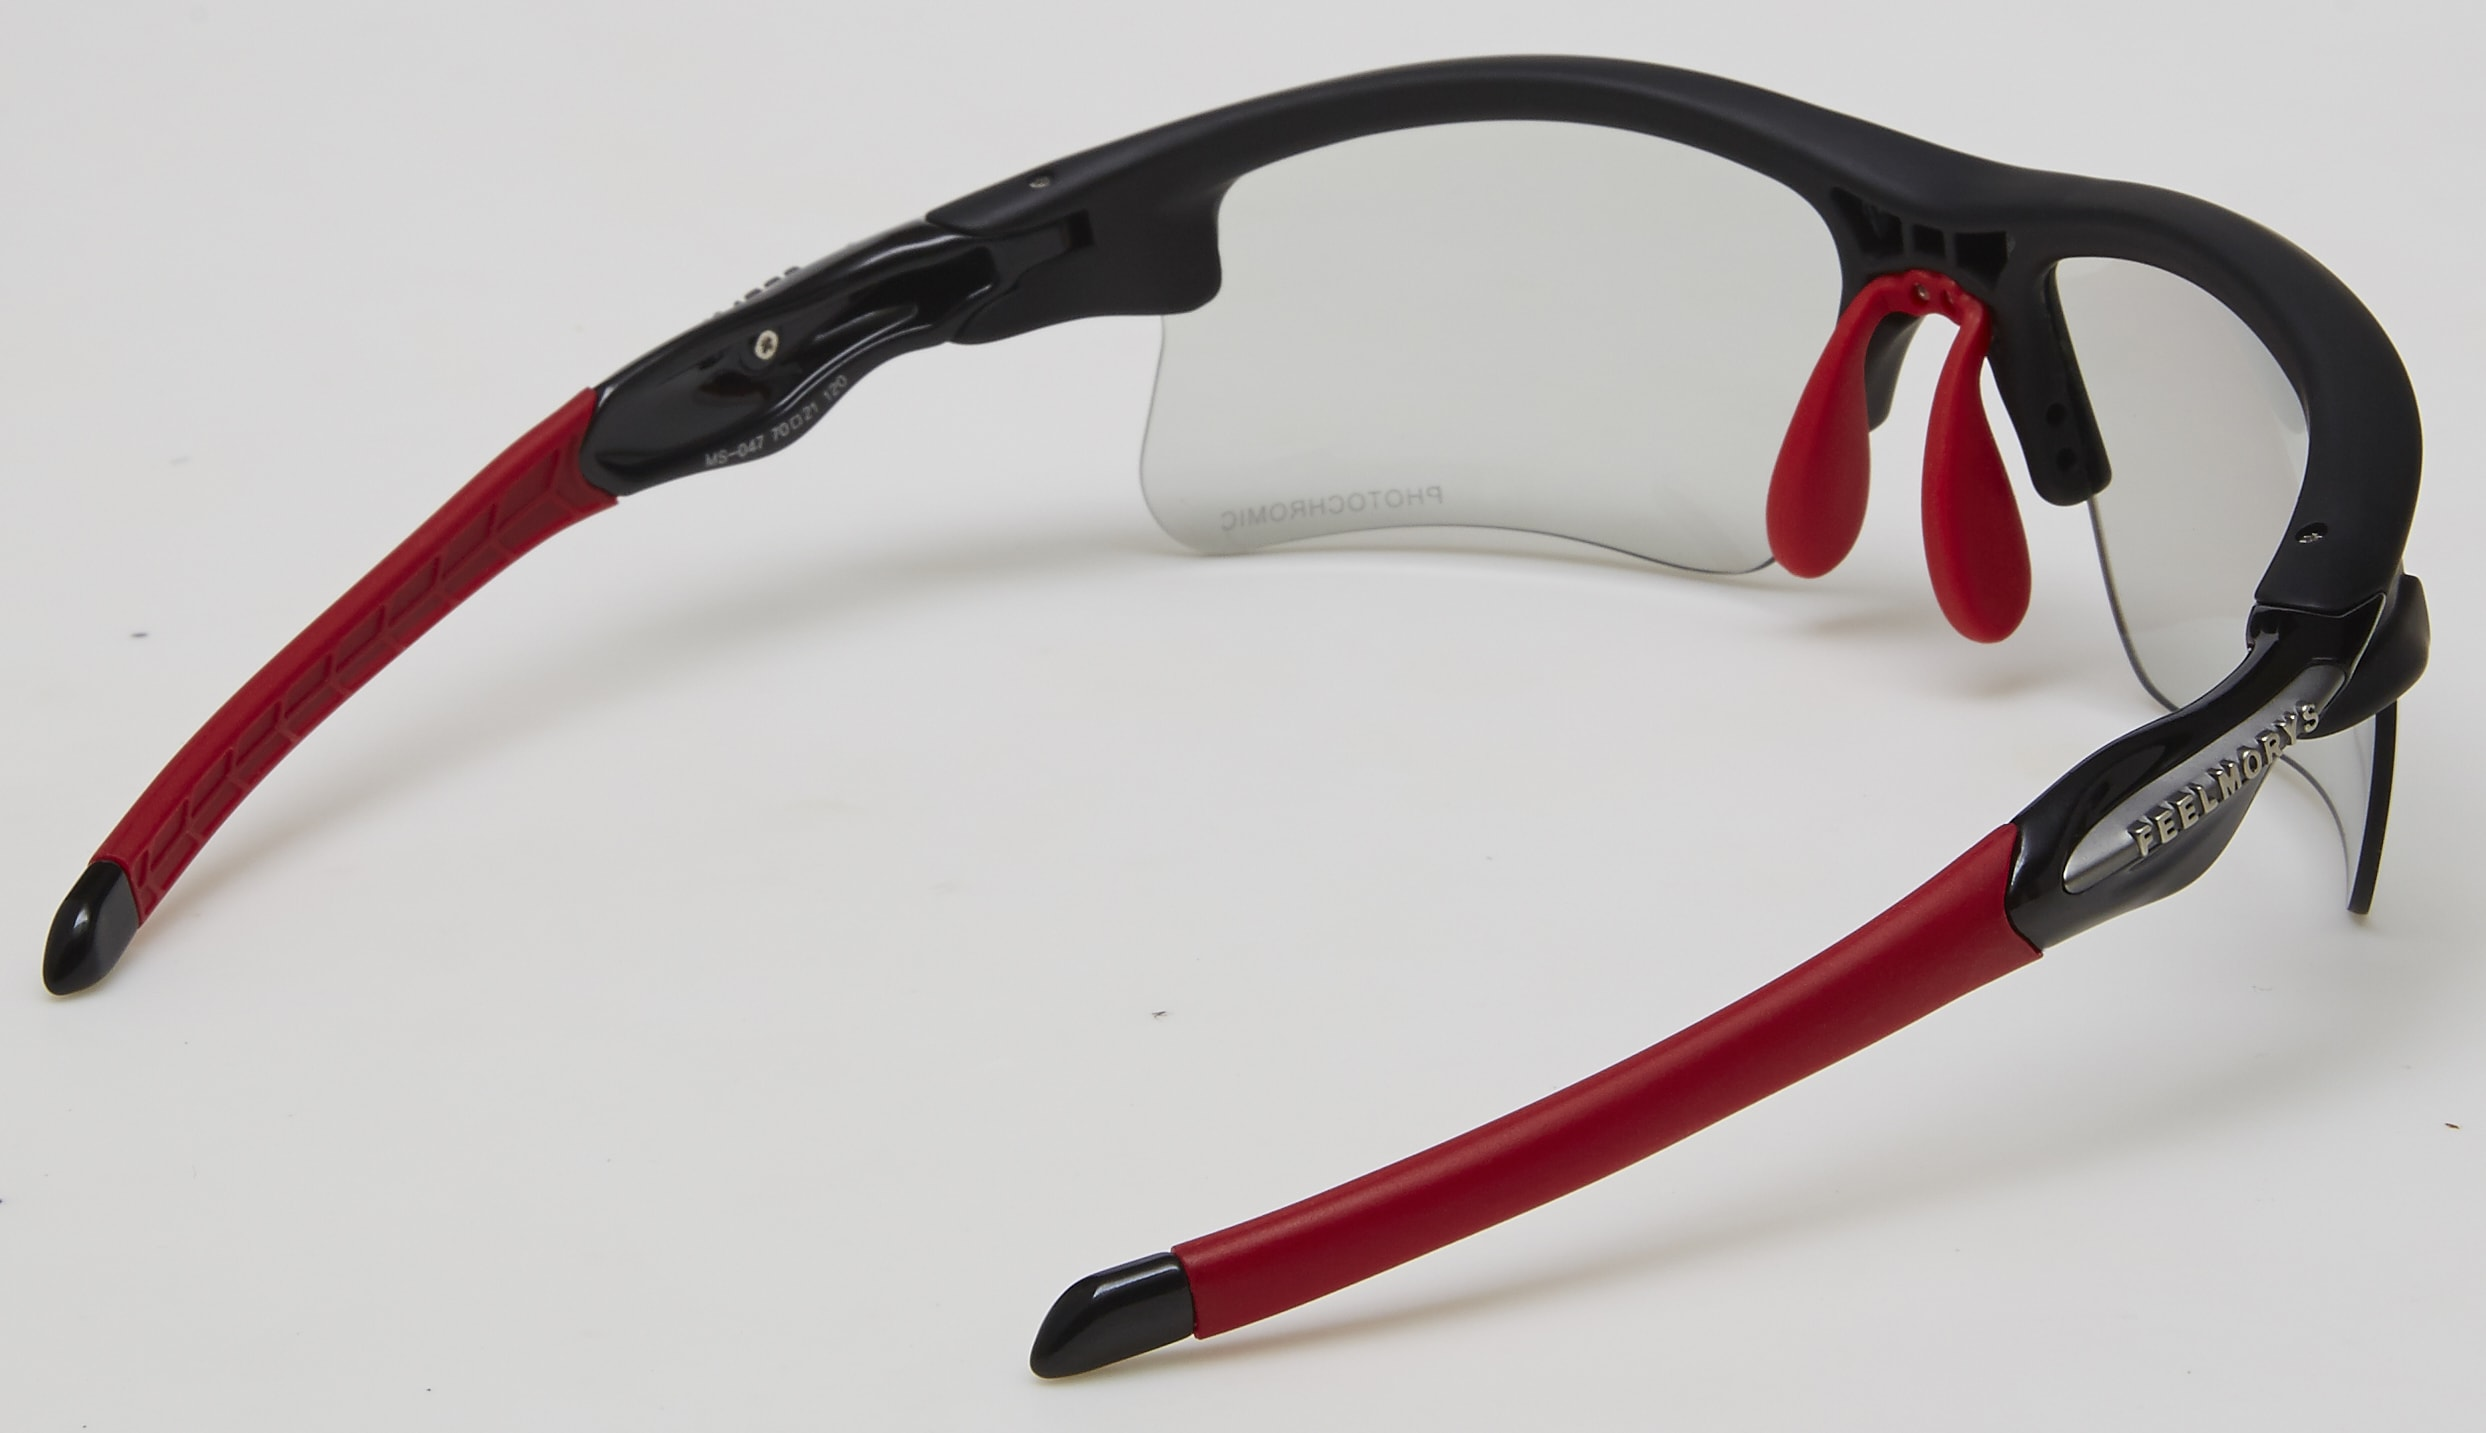 trasera feel morys ms-047 fotocromatica negra roja